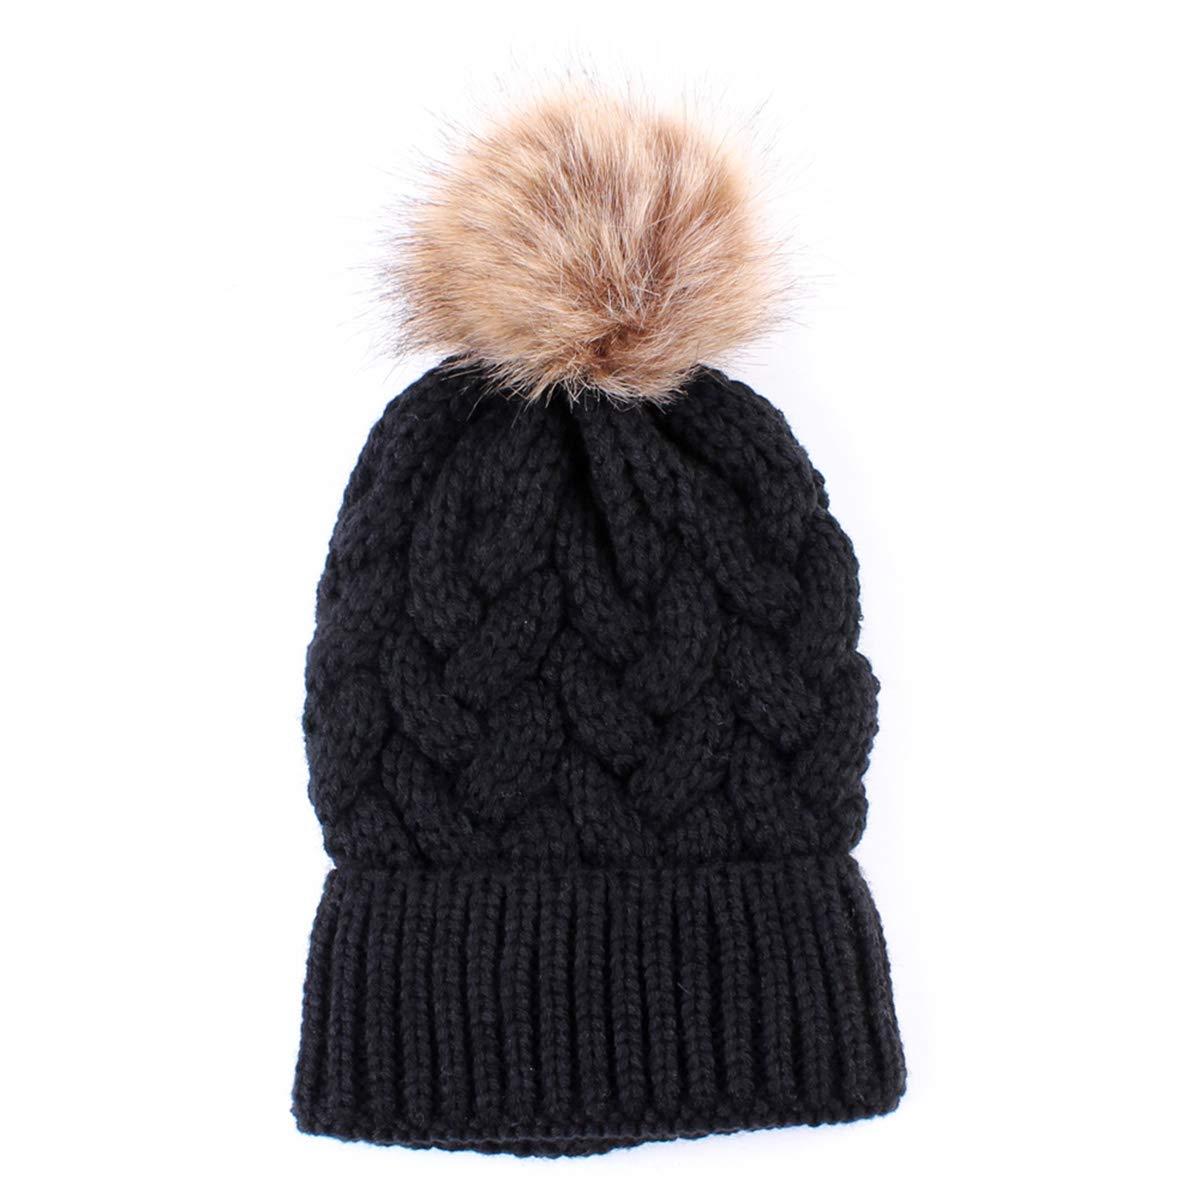 ef70c2ab 2PCS Mother&Baby Hat Family Matching Cap Winter Warmer Knit Wool Beanie Ski  Cap (Black): Amazon.co.uk: Clothing